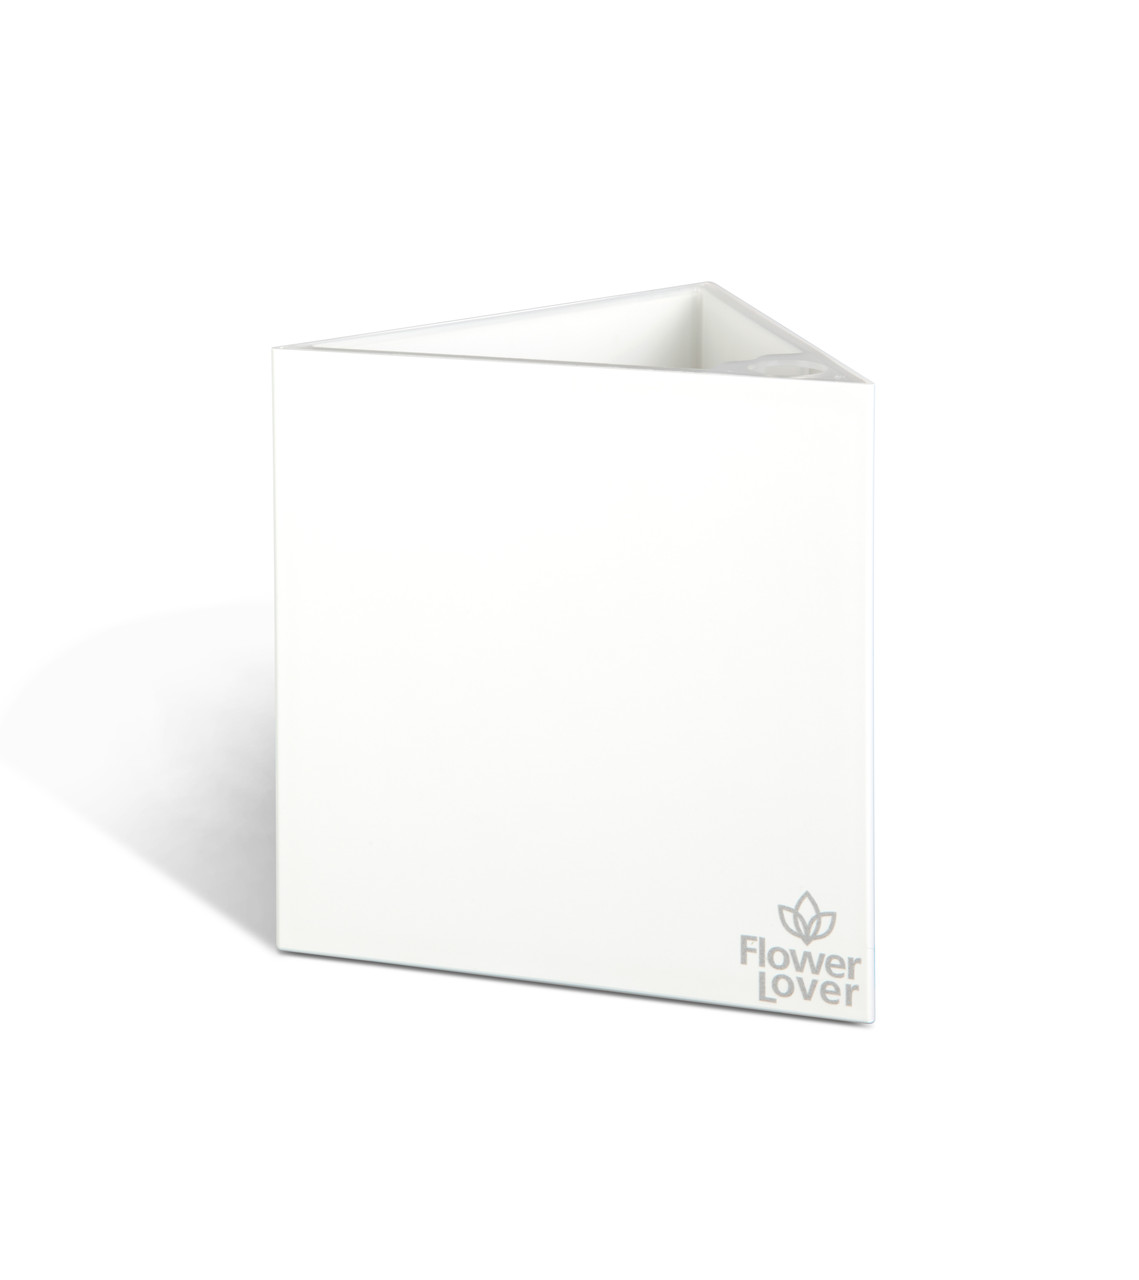 Умный вазон с системой автополива Triangle  Flower Lover 14x14x14 см глянецевый PLASTKON